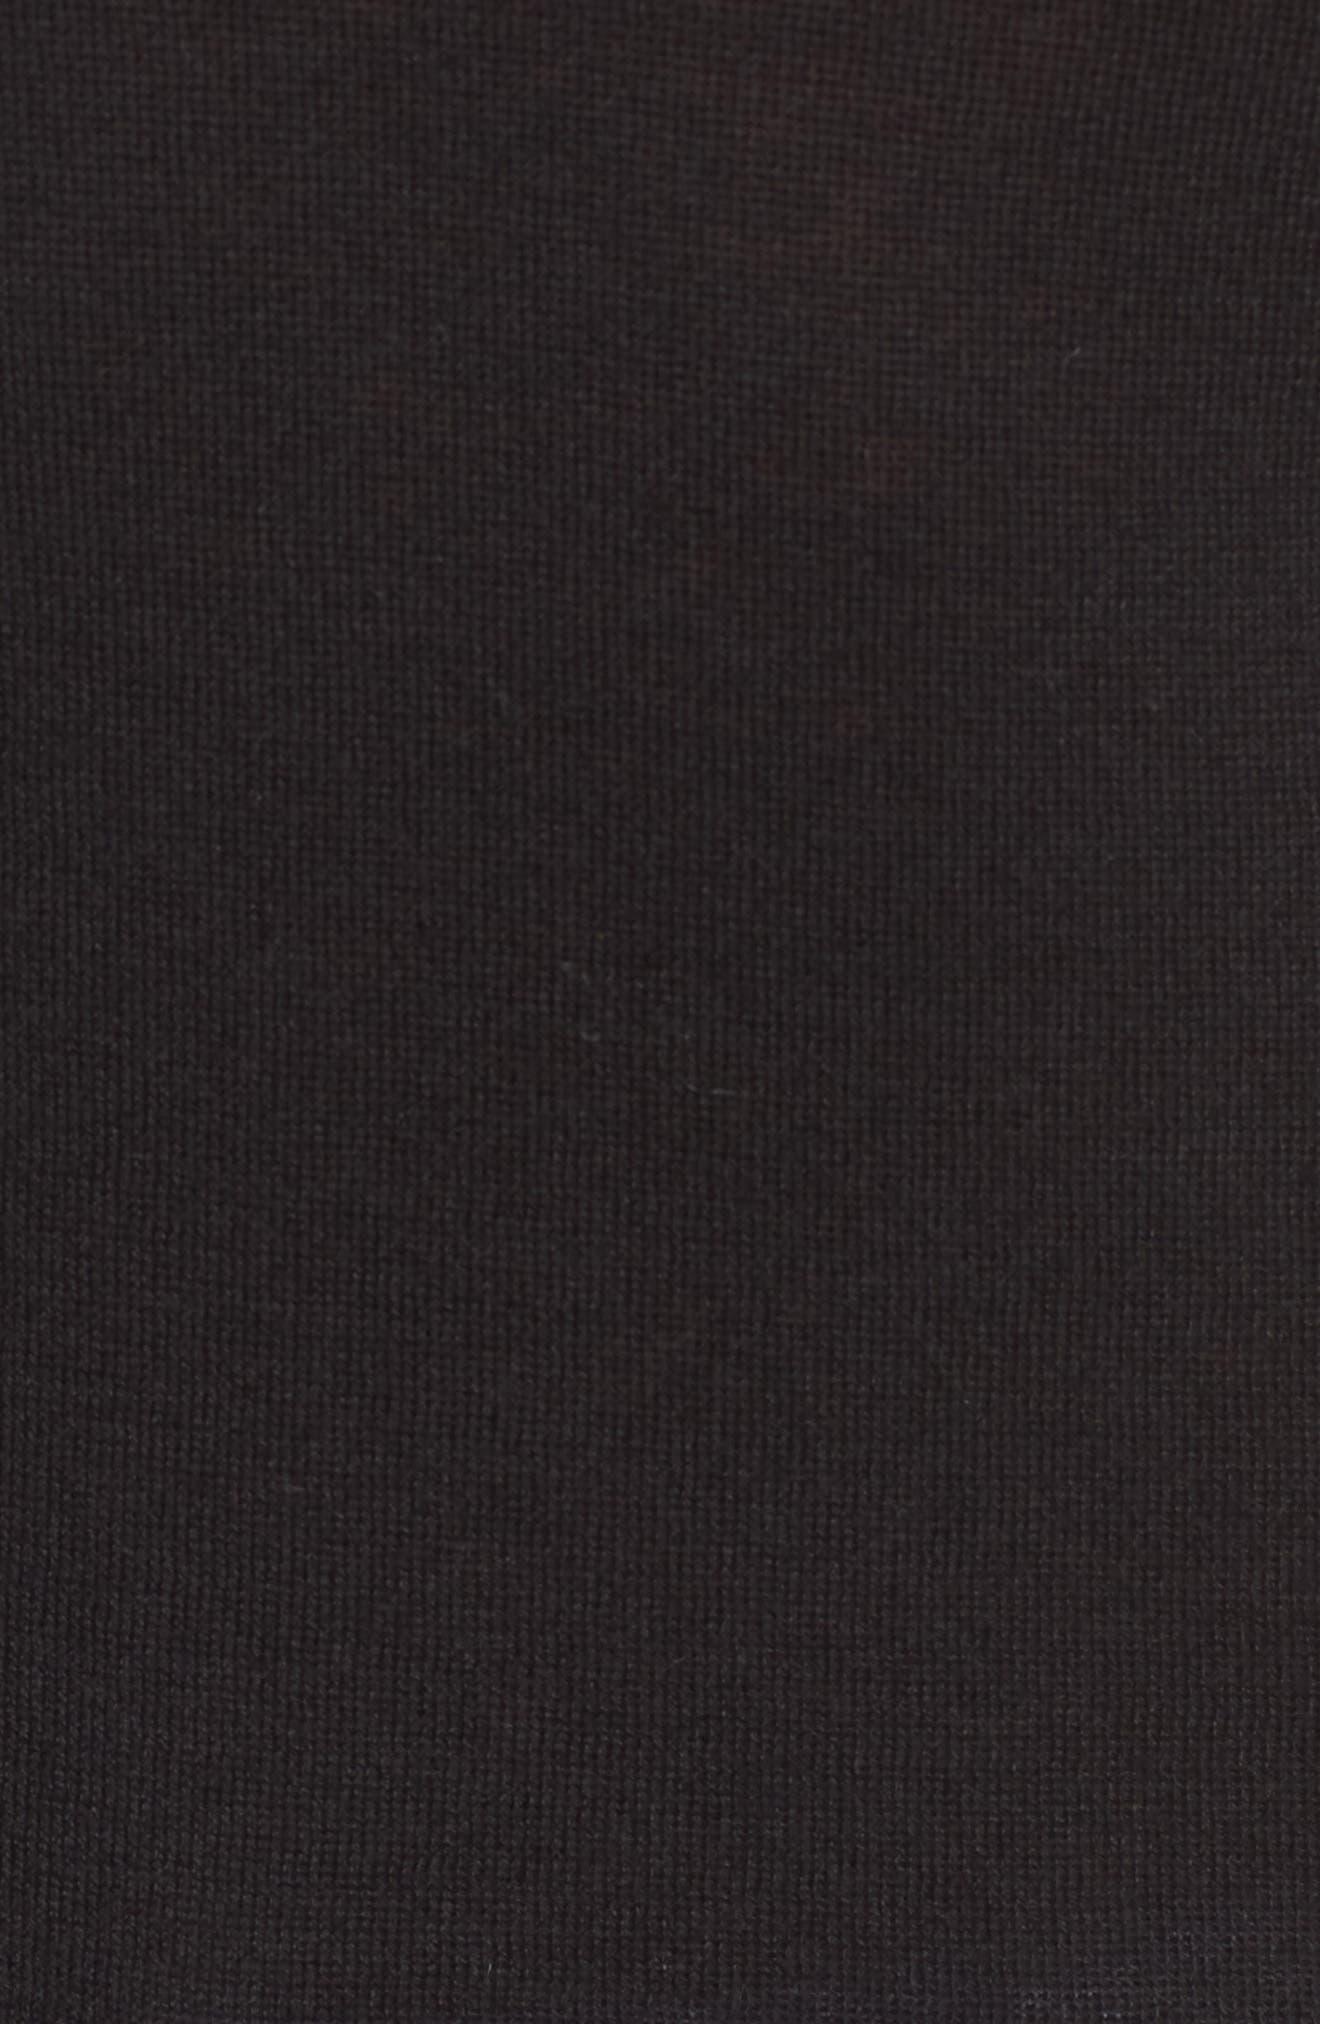 Cotton Blend Pullover,                             Alternate thumbnail 158, color,